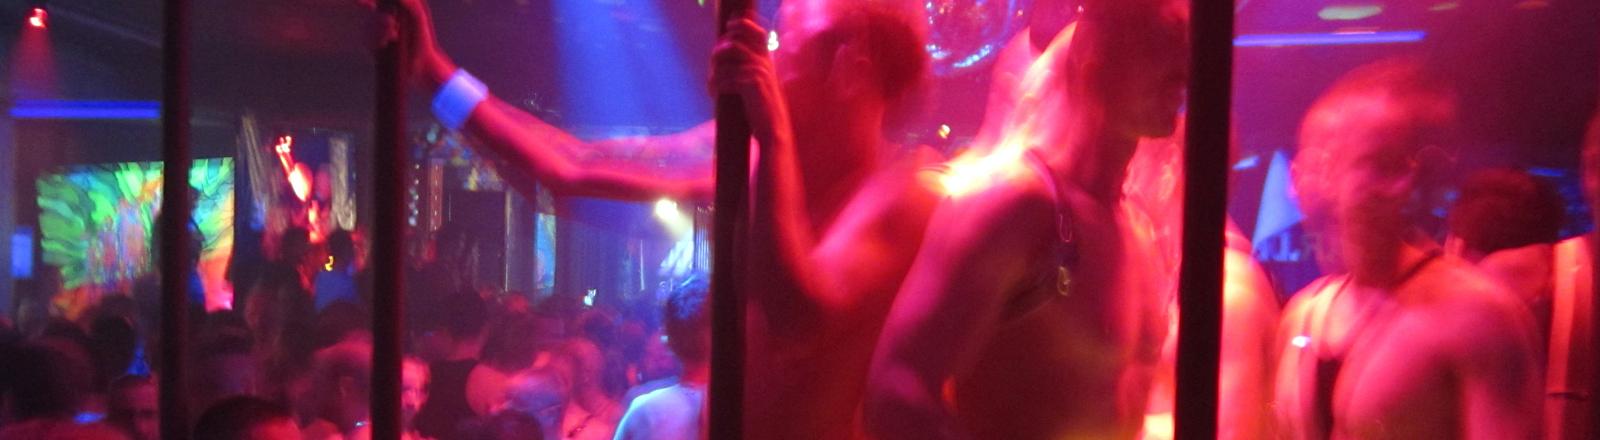 Die schwule Pornoparty HustlaBall am Freitag (21.10.2011) im Kitkat Club in Berlin.